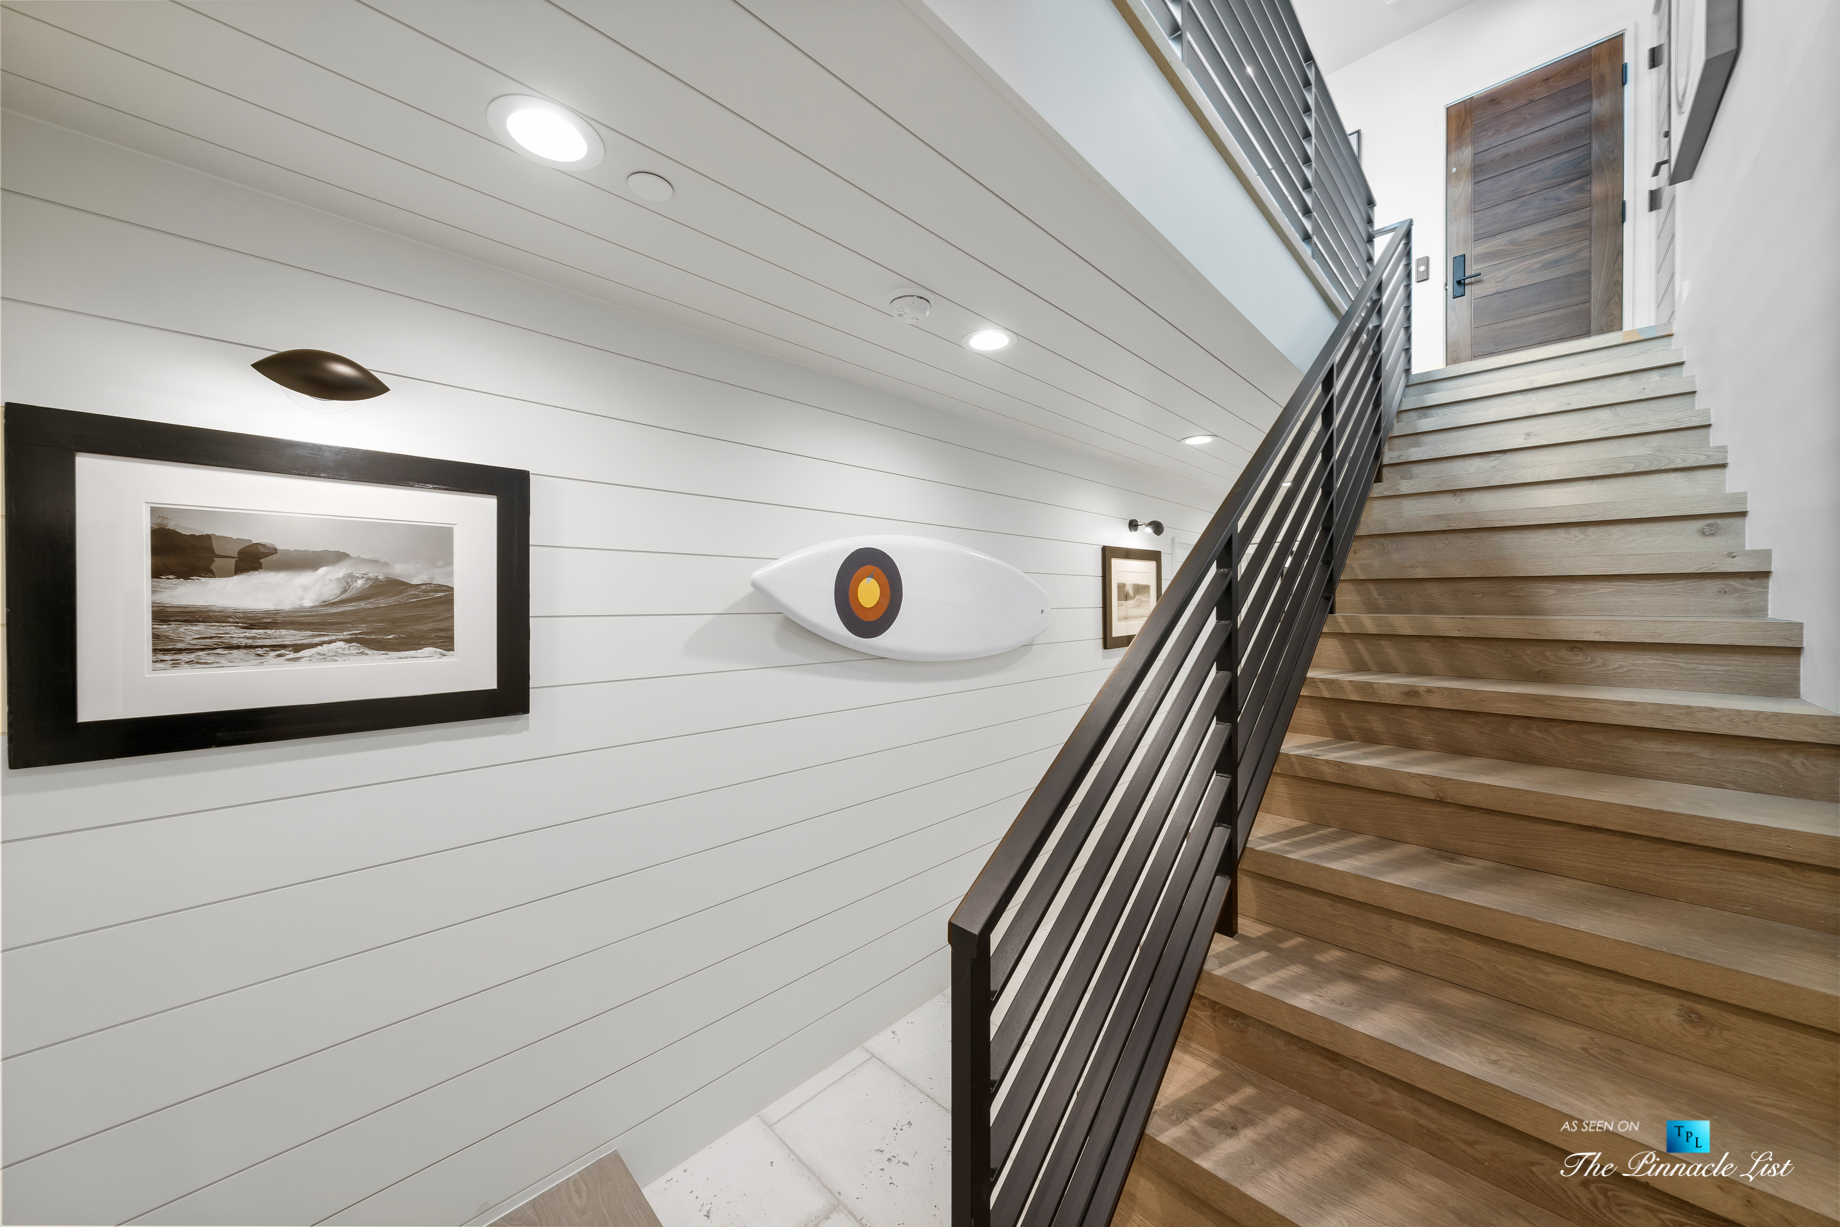 508 The Strand, Manhattan Beach, CA, USA - Lower Hallway Stairs - Luxury Real Estate - Oceanfront Home